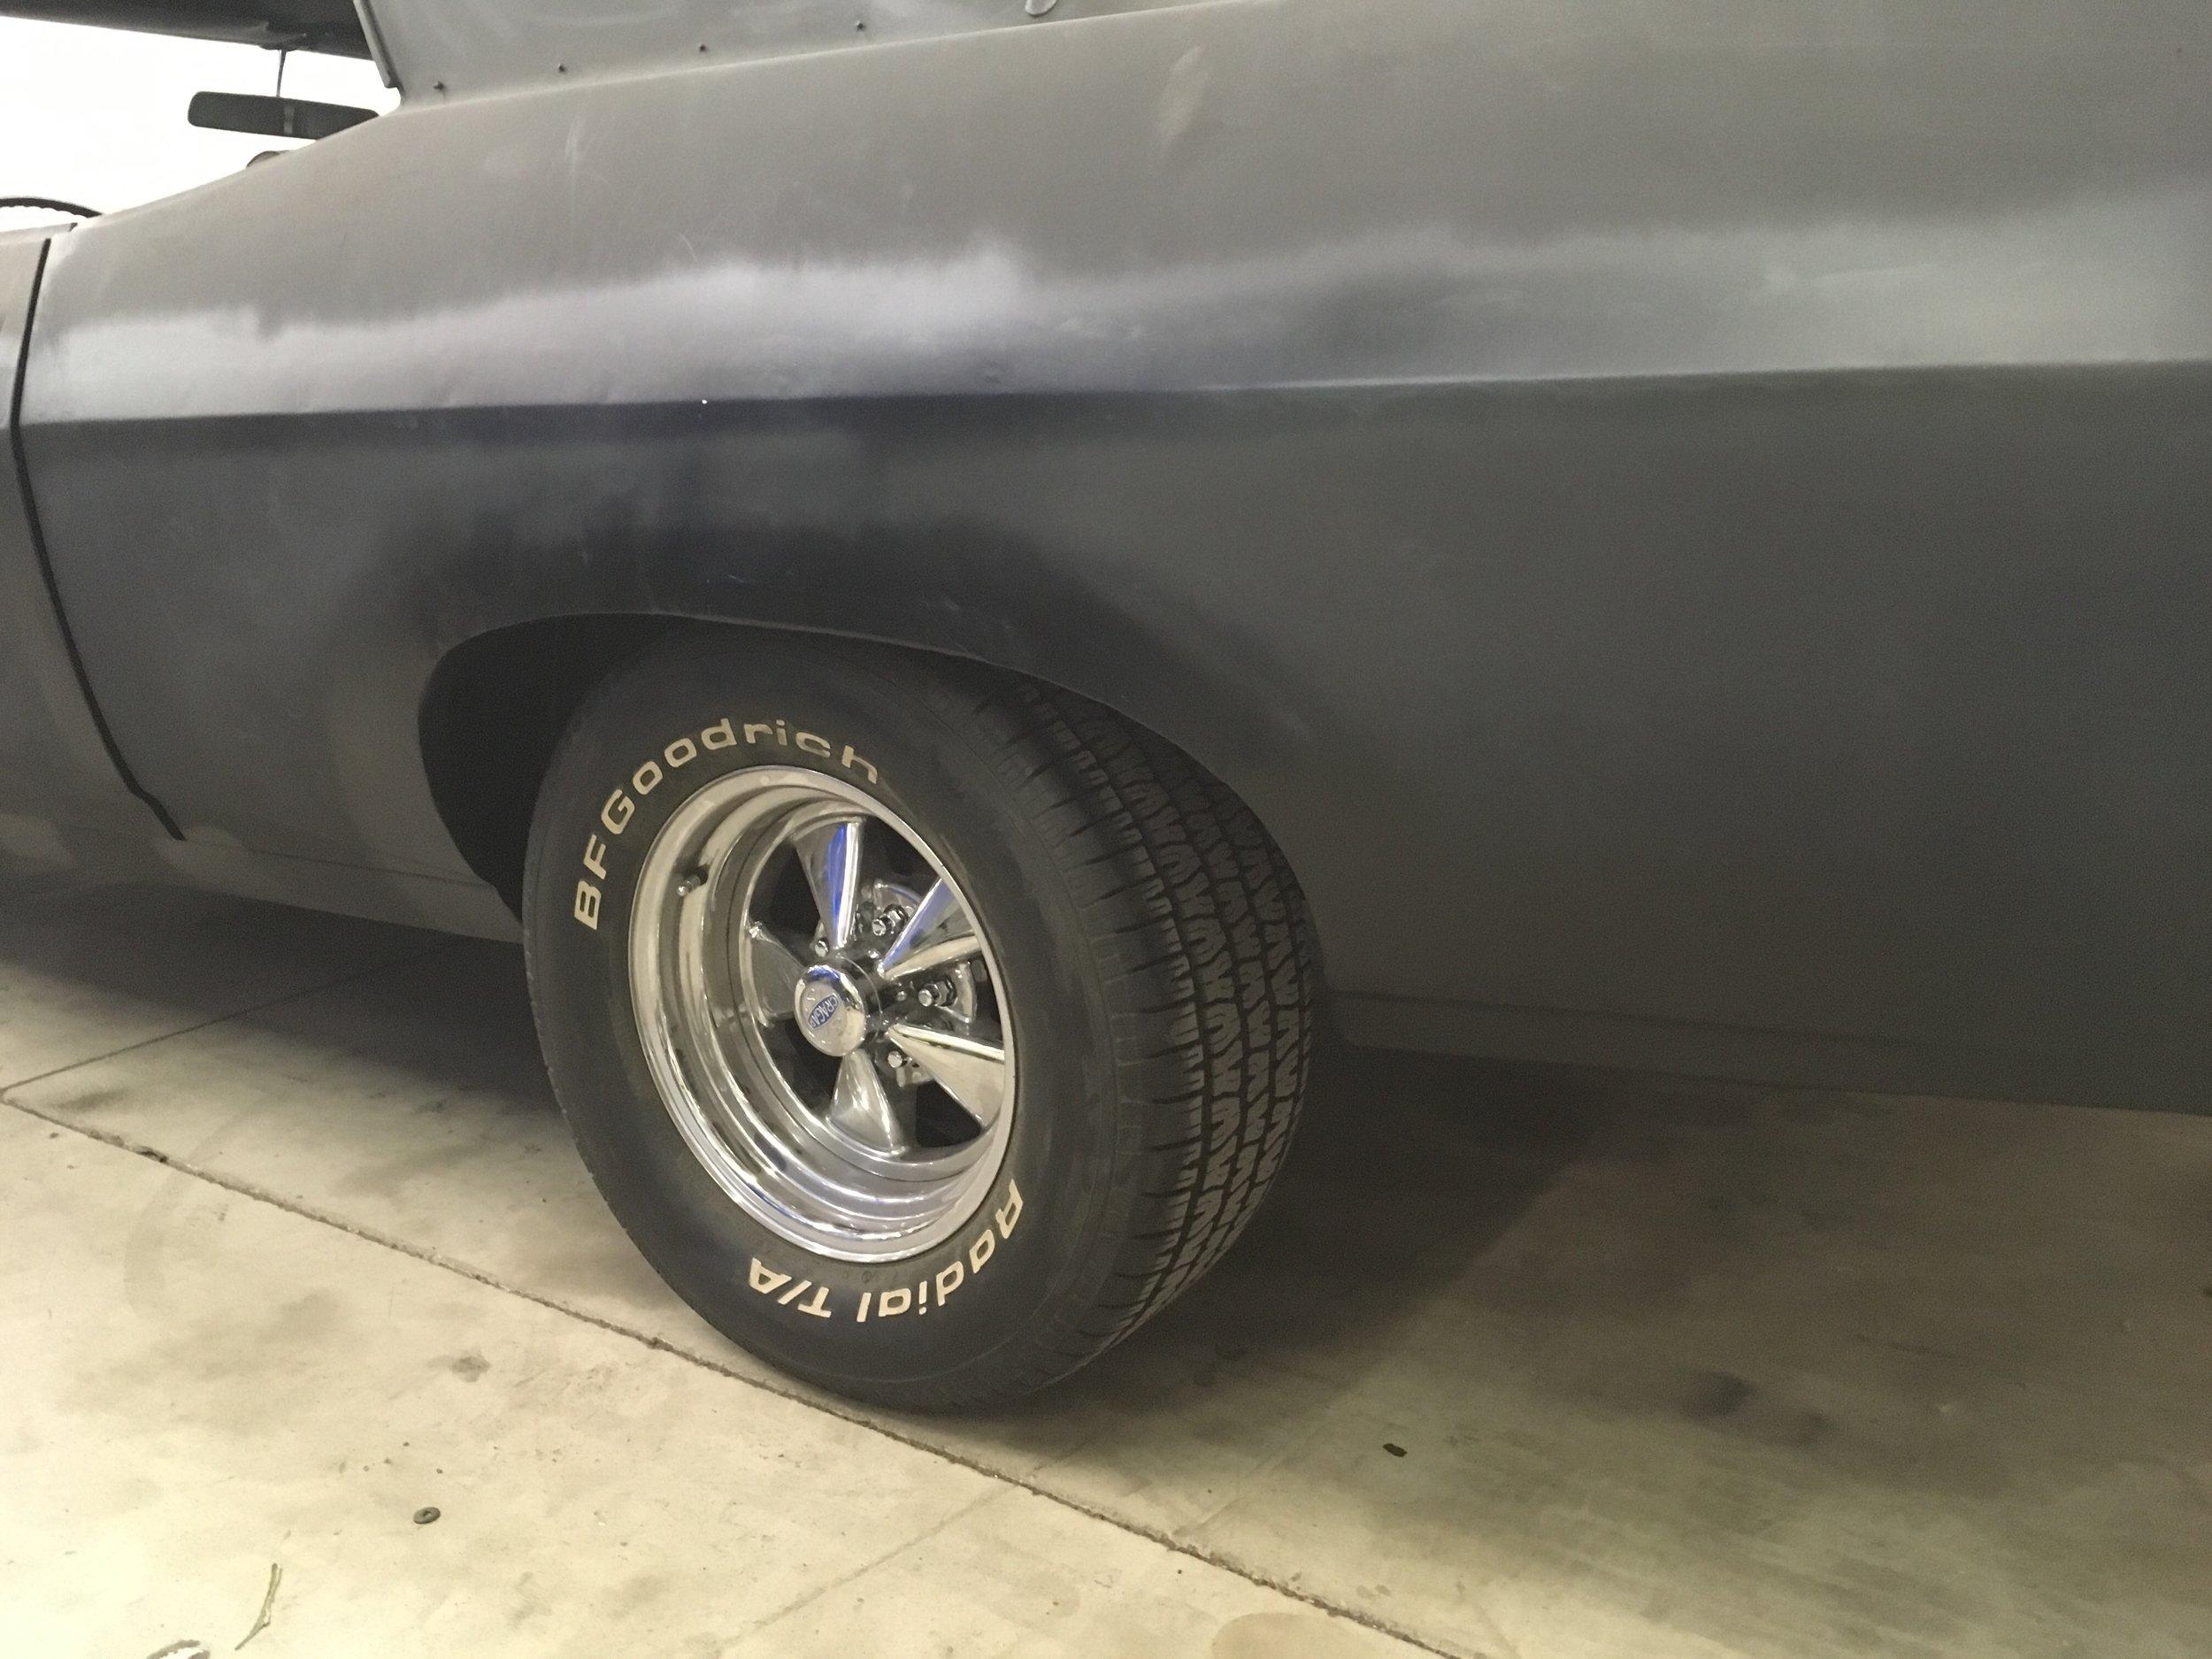 1970-impala-bodywork-minneapolis-car-restoration-hot-rod-factory.jpg